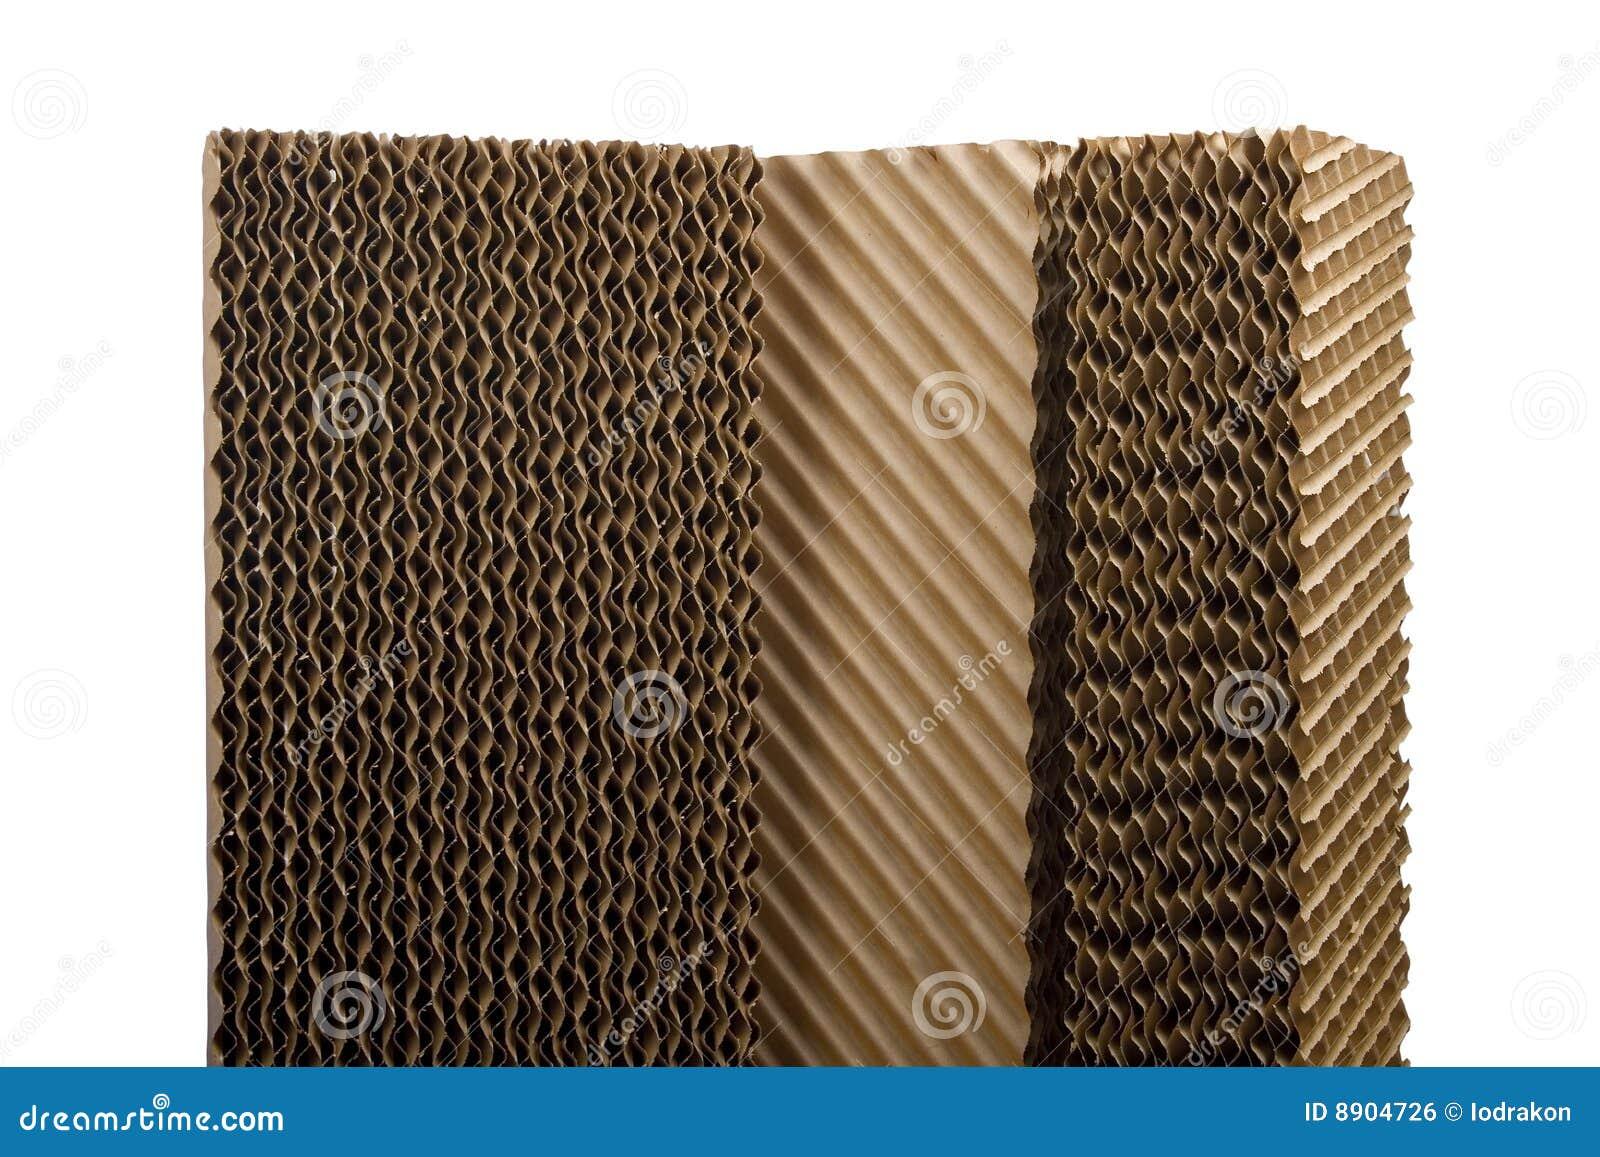 Evaporative Cooling Pads : Evaporative cooling pads royalty free stock image